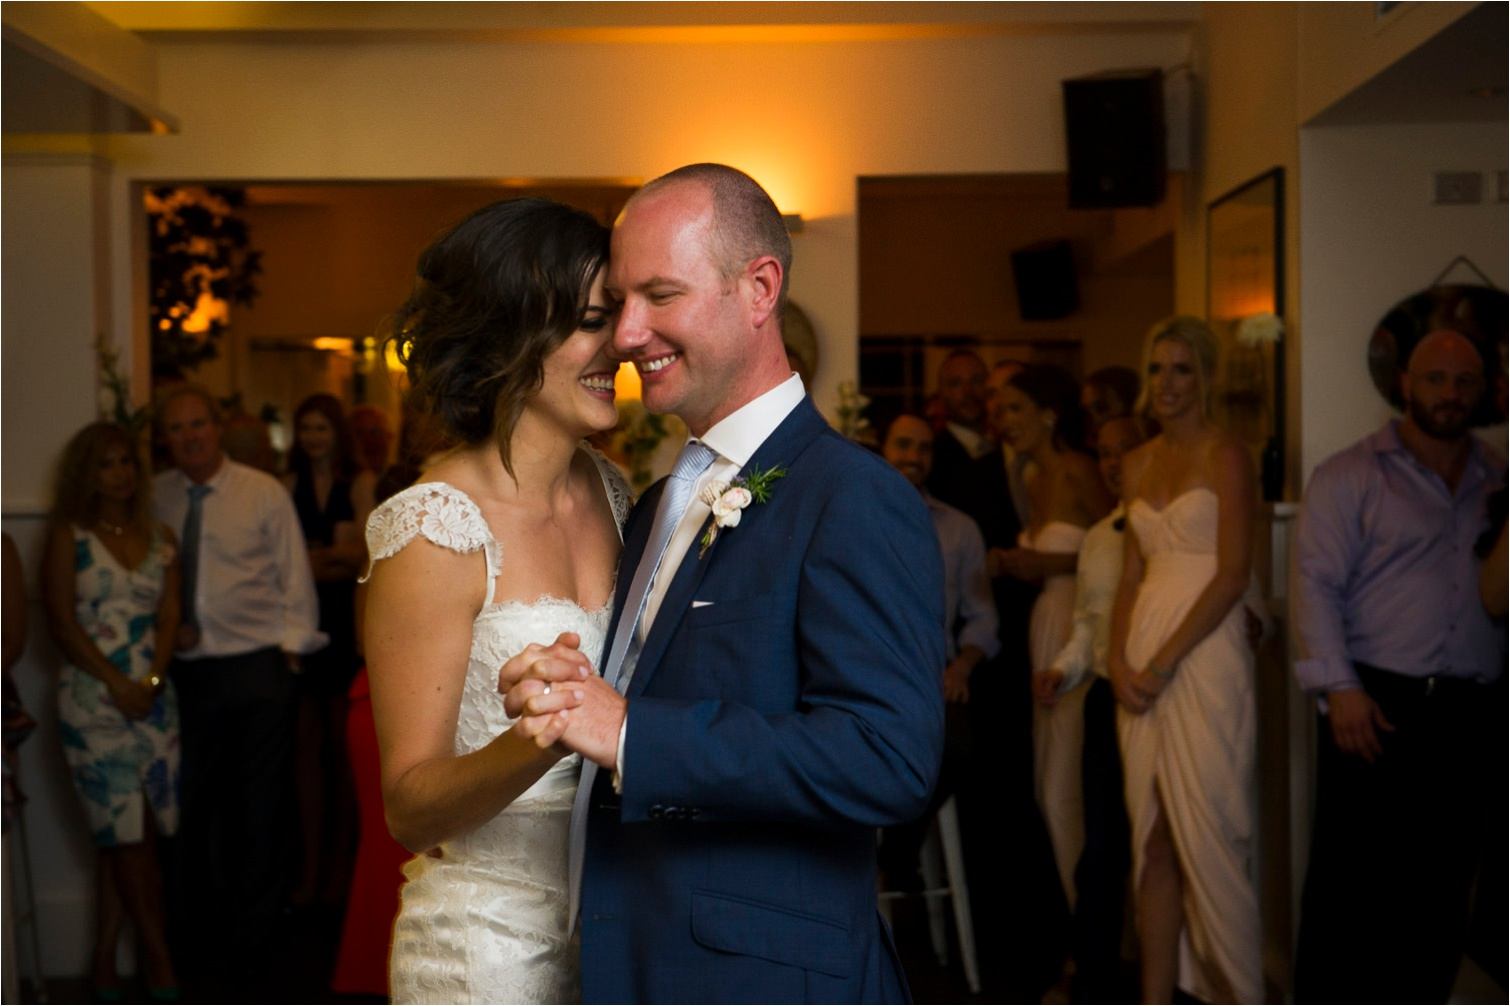 Nicole&Carlie_Watsons_Bay_Hotel_Wedding_by_Gold_Coast_Photographers-The_Follans58.jpg